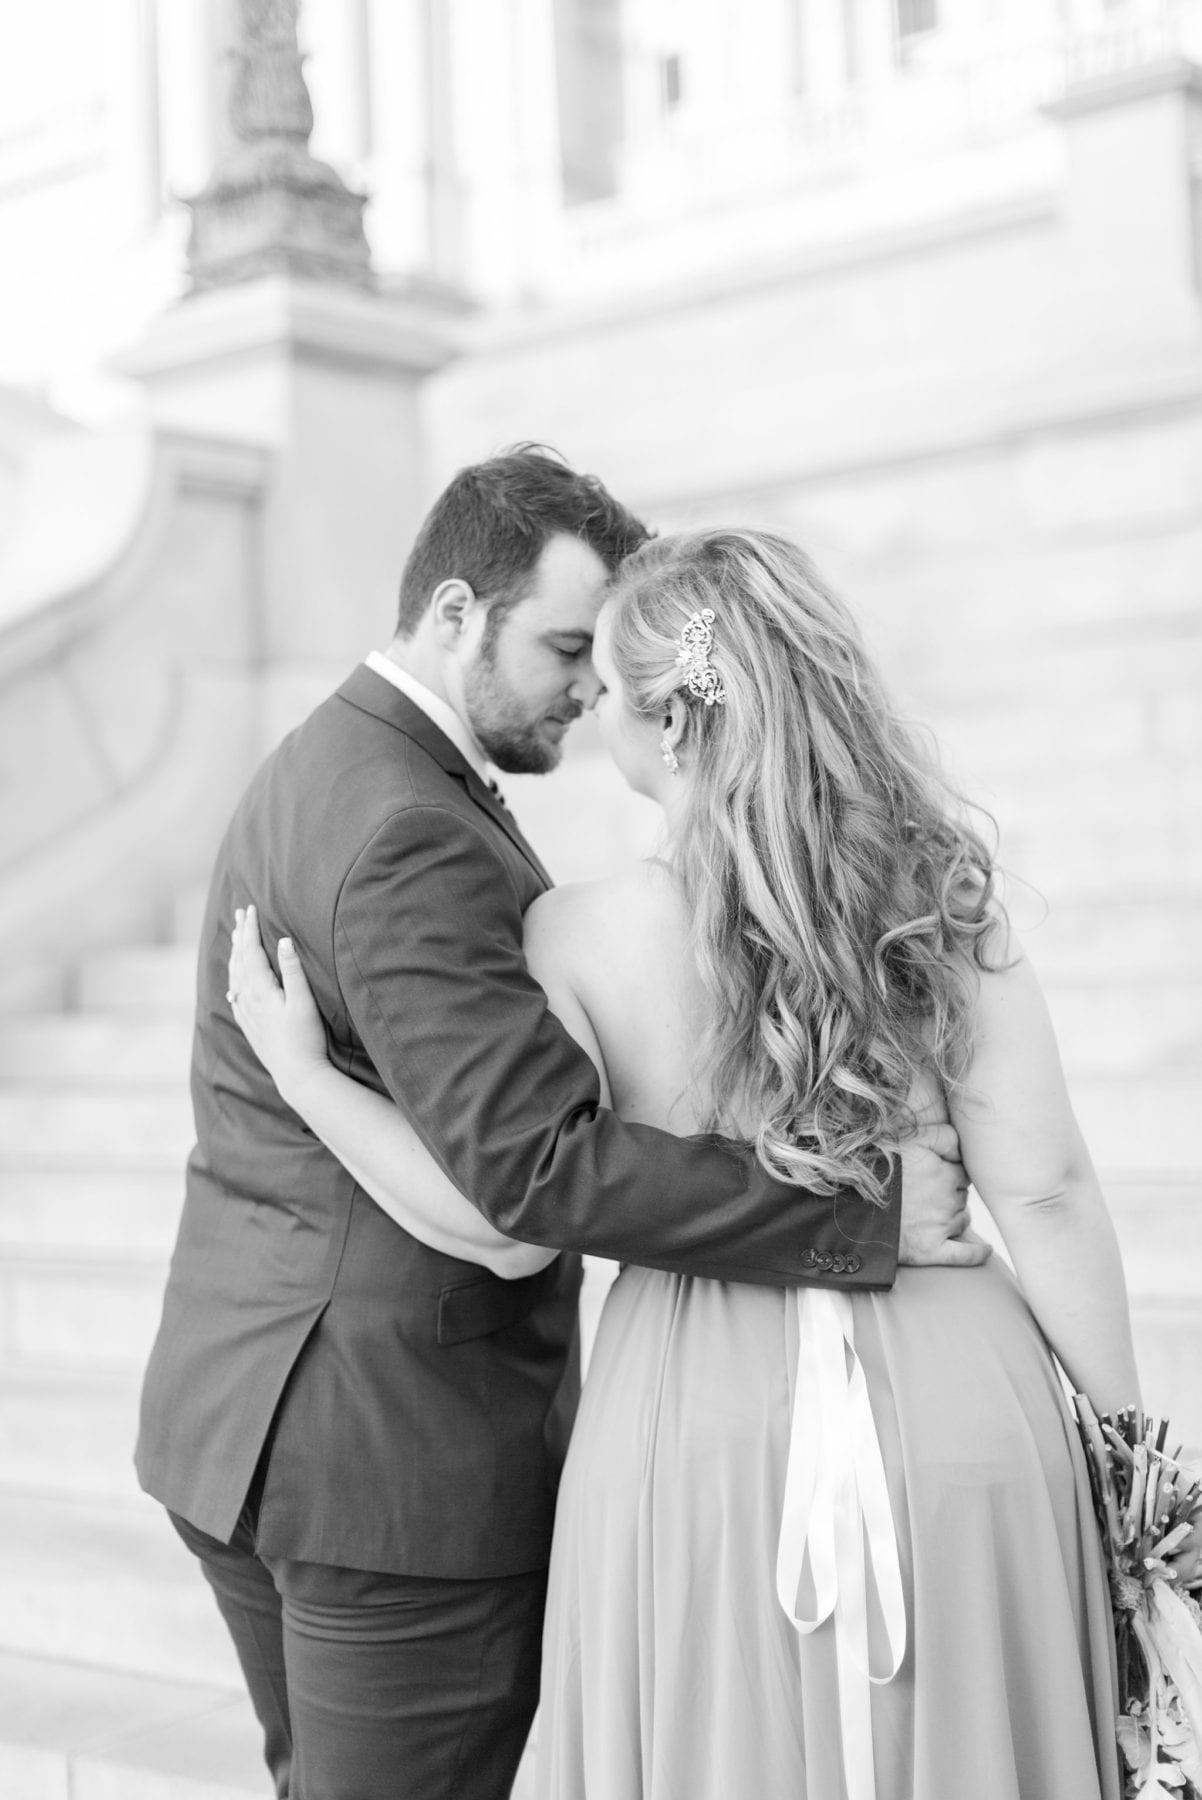 Capitol Hill Engagement Photos Kelly & Zach Washington DC Wedding Photographer Megan Kelsey Photography-284.jpg